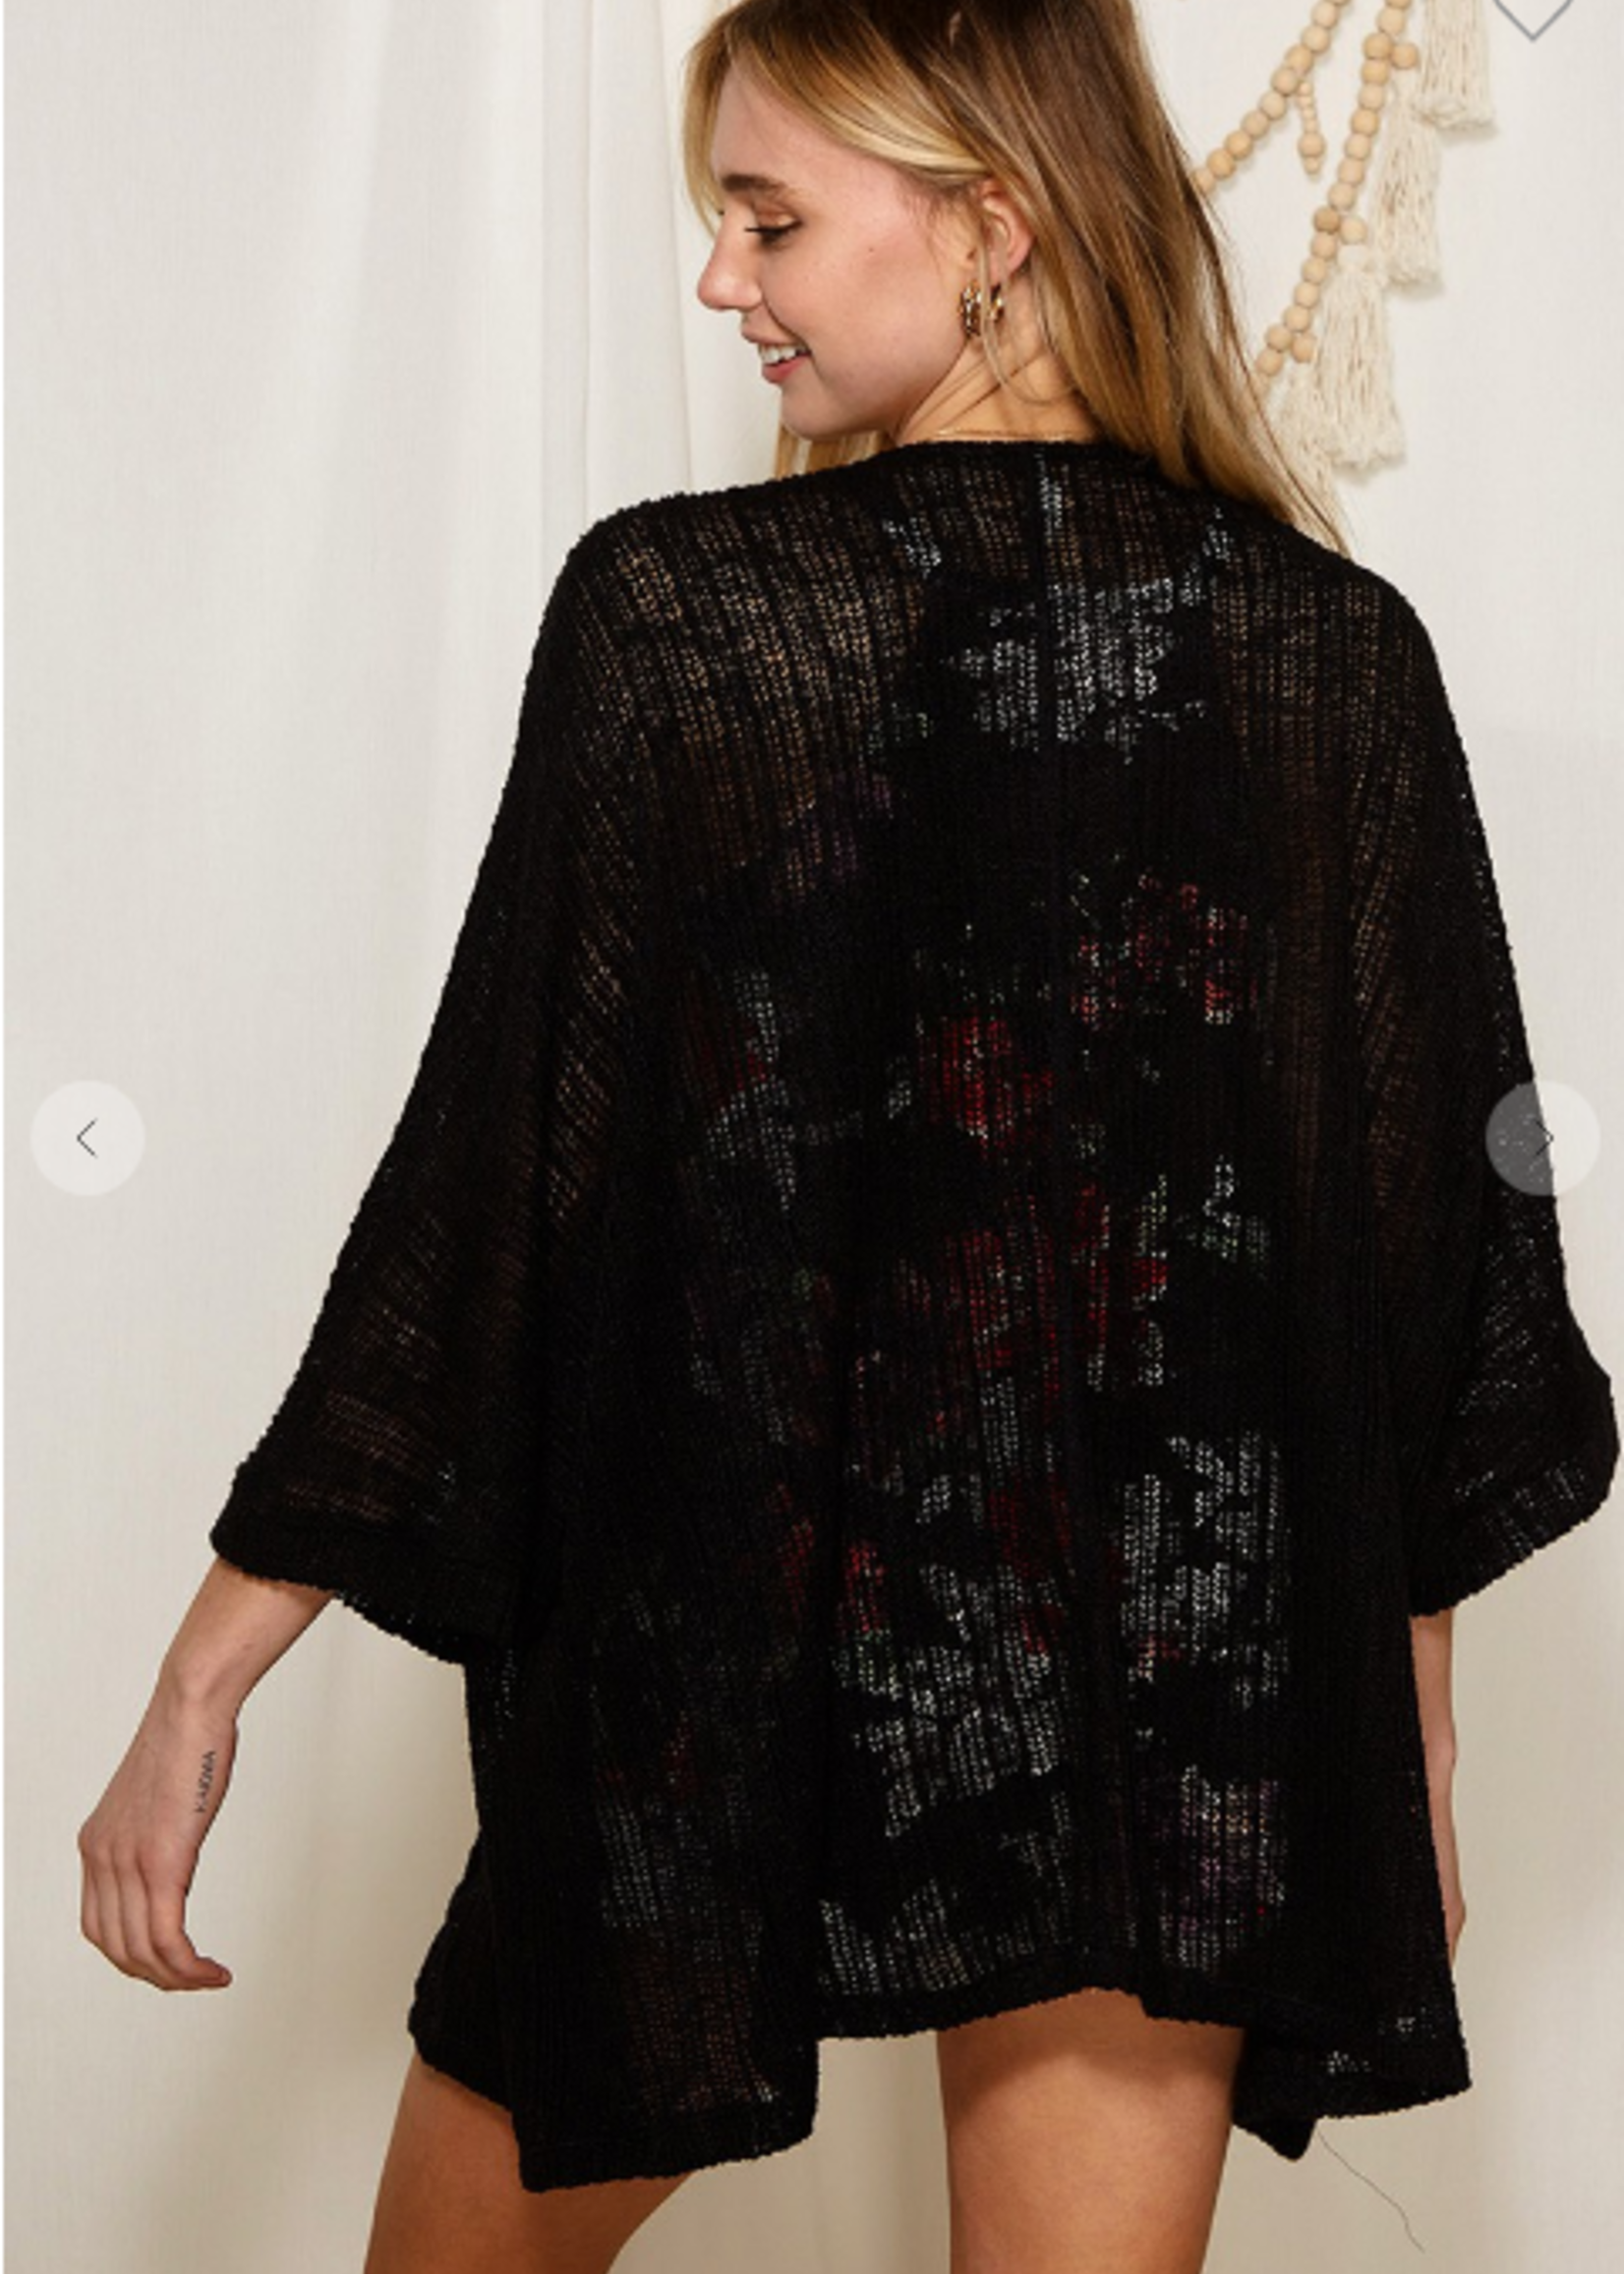 Open Sweater Knit Cardigan - Black